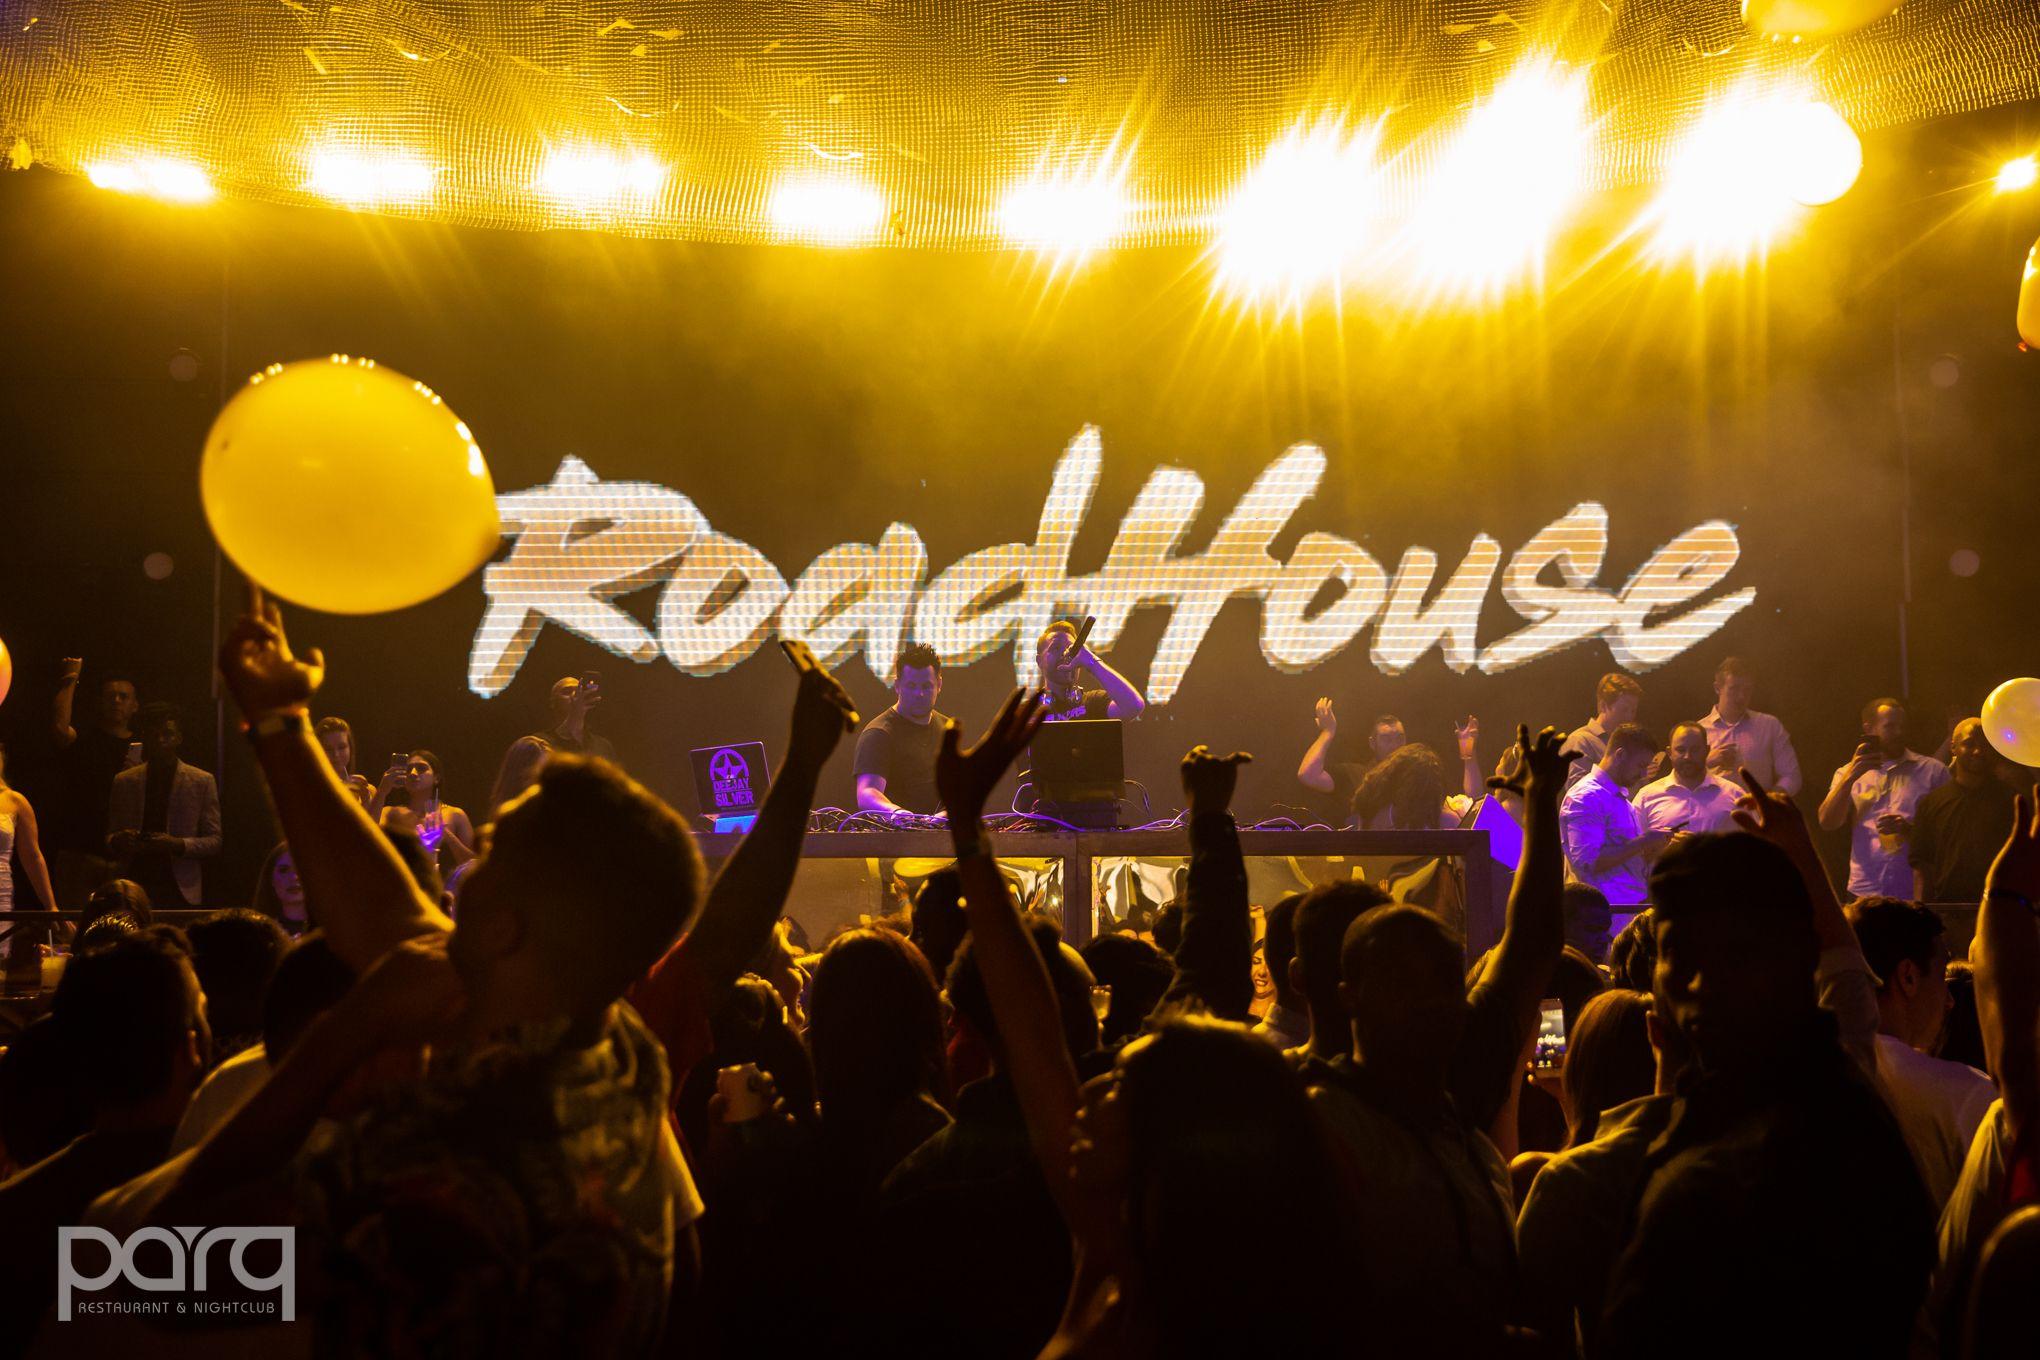 08.31.19 Parq - Roadhouse-16.jpg